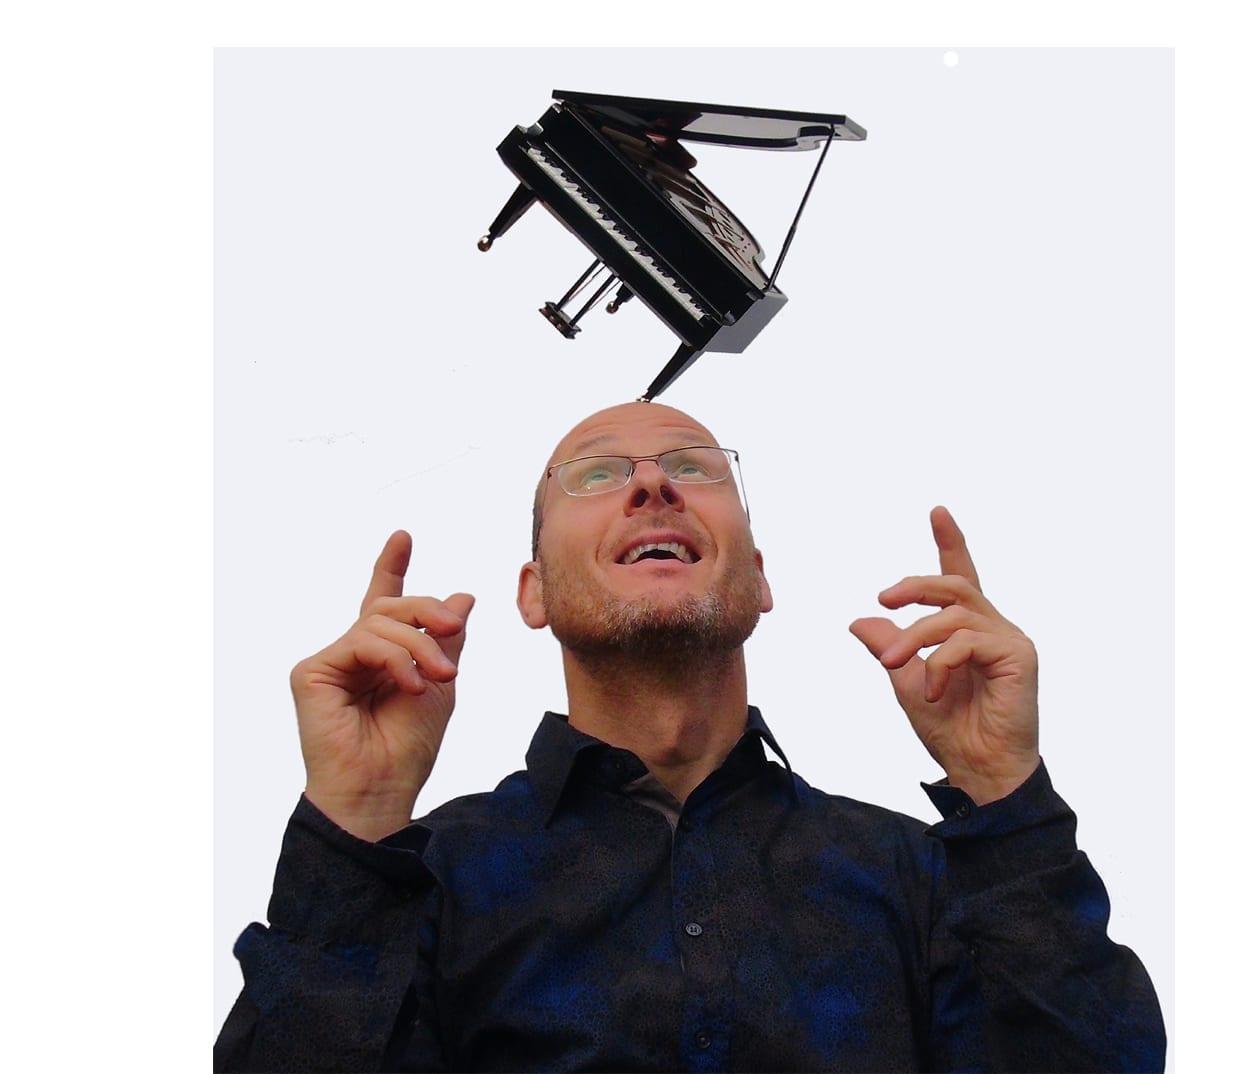 Pianobalance 4 350 dpi